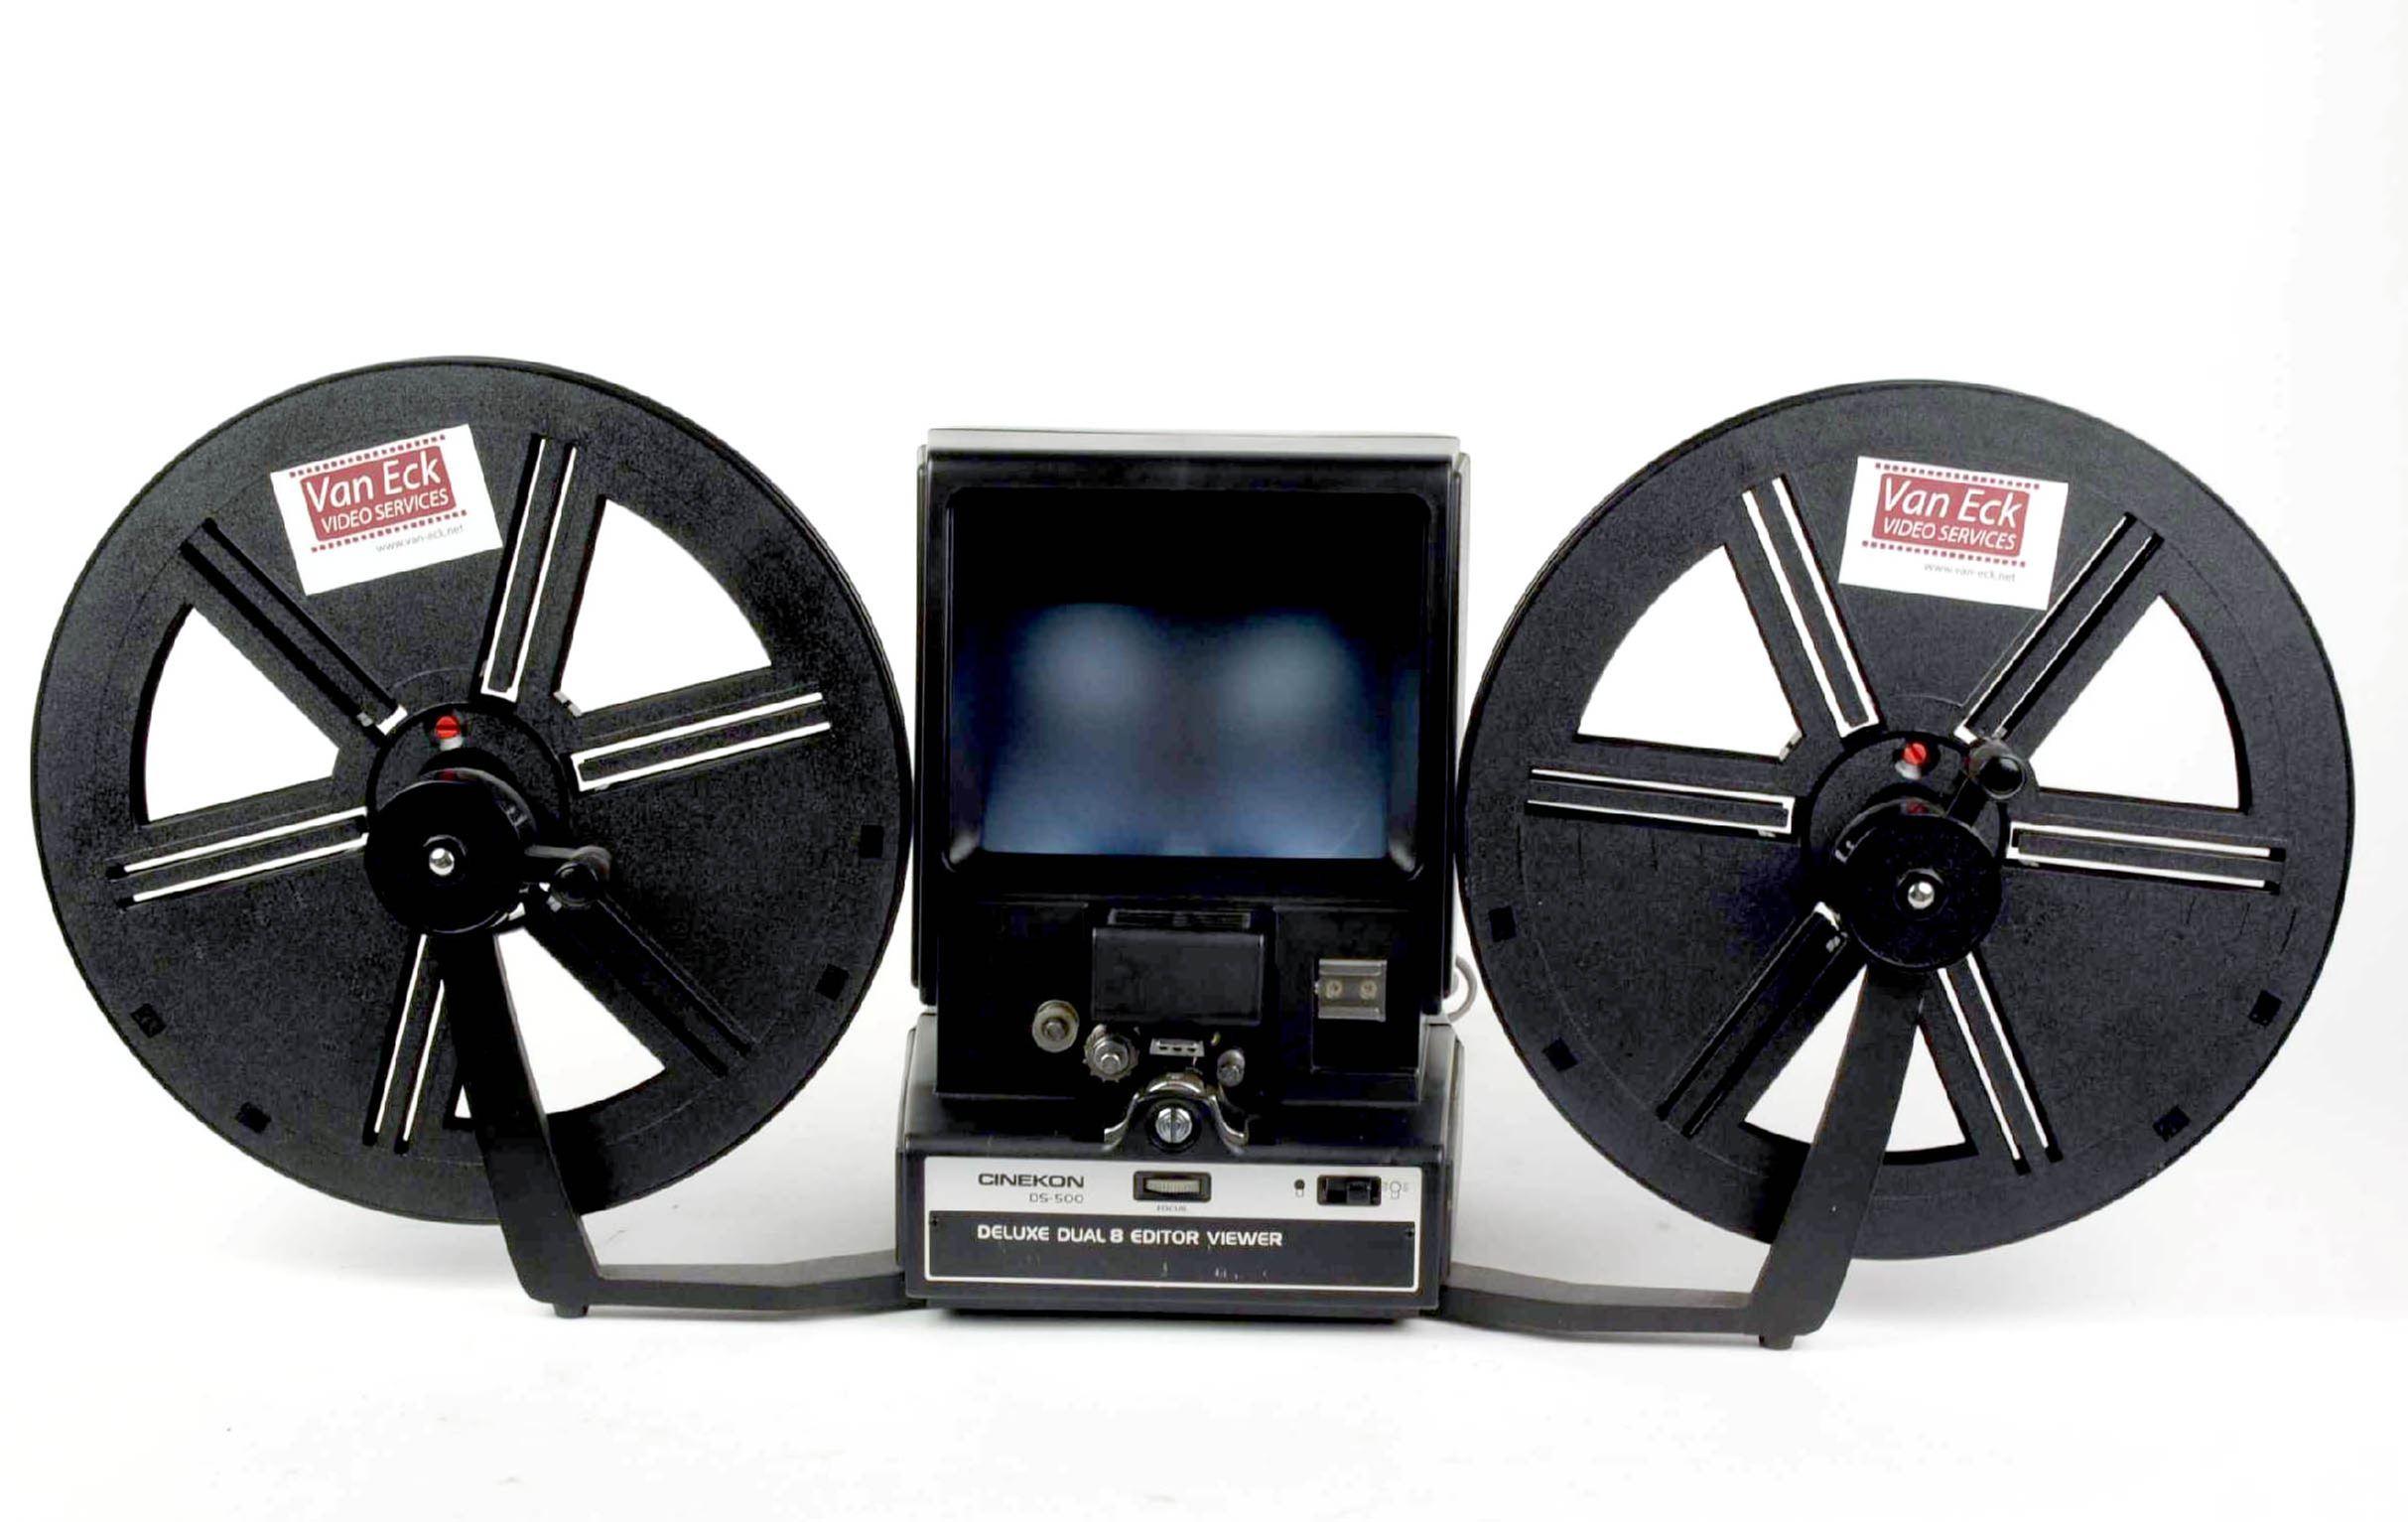 DS-500 Deluxe Dual 8